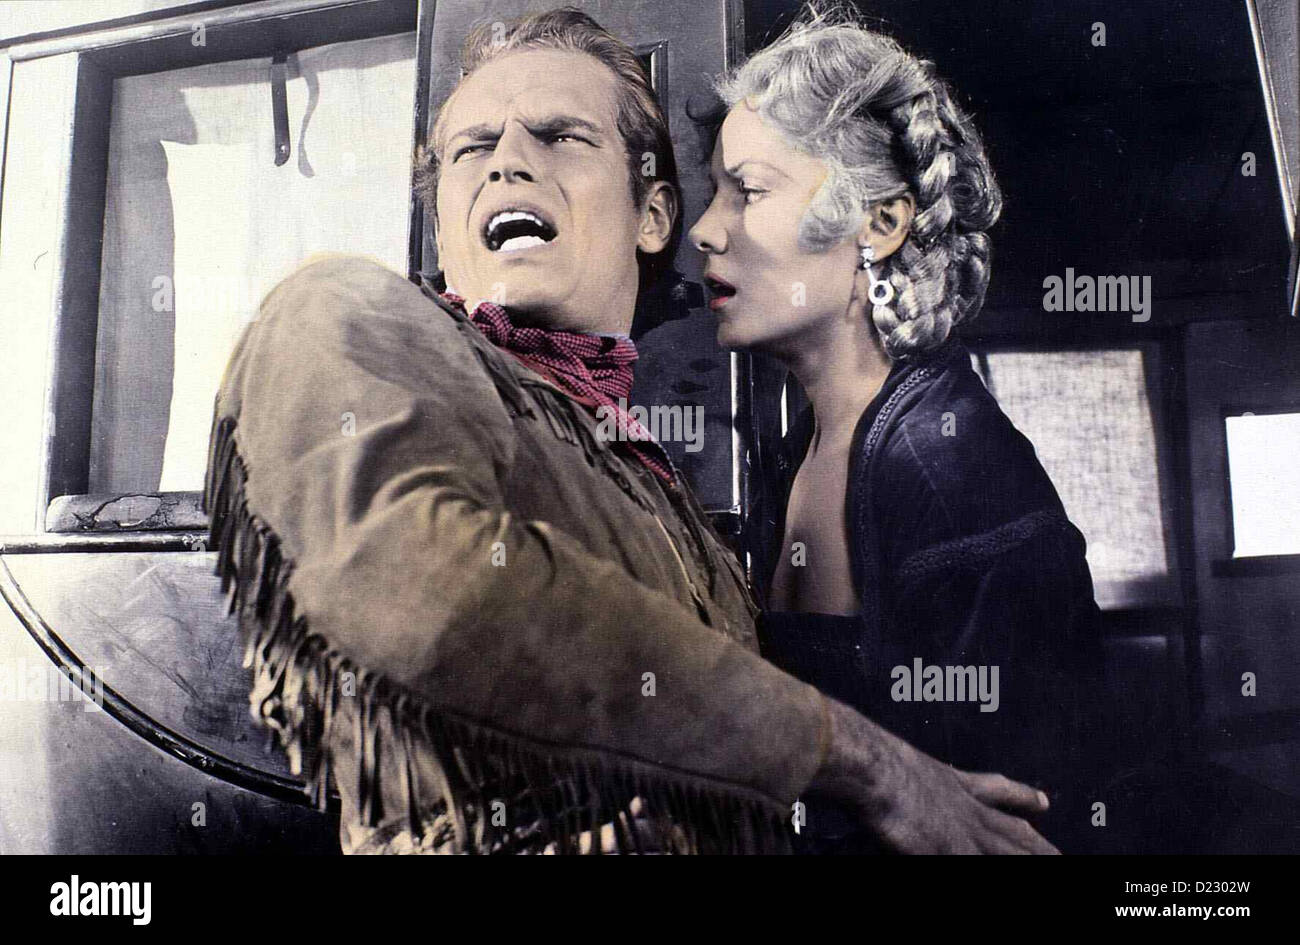 Die Eclaireur Pony Express Charlton Heston, Rhonda Fleming Buffalo Bill Cody (Charlton Heston) eine Pony Express Photo Stock